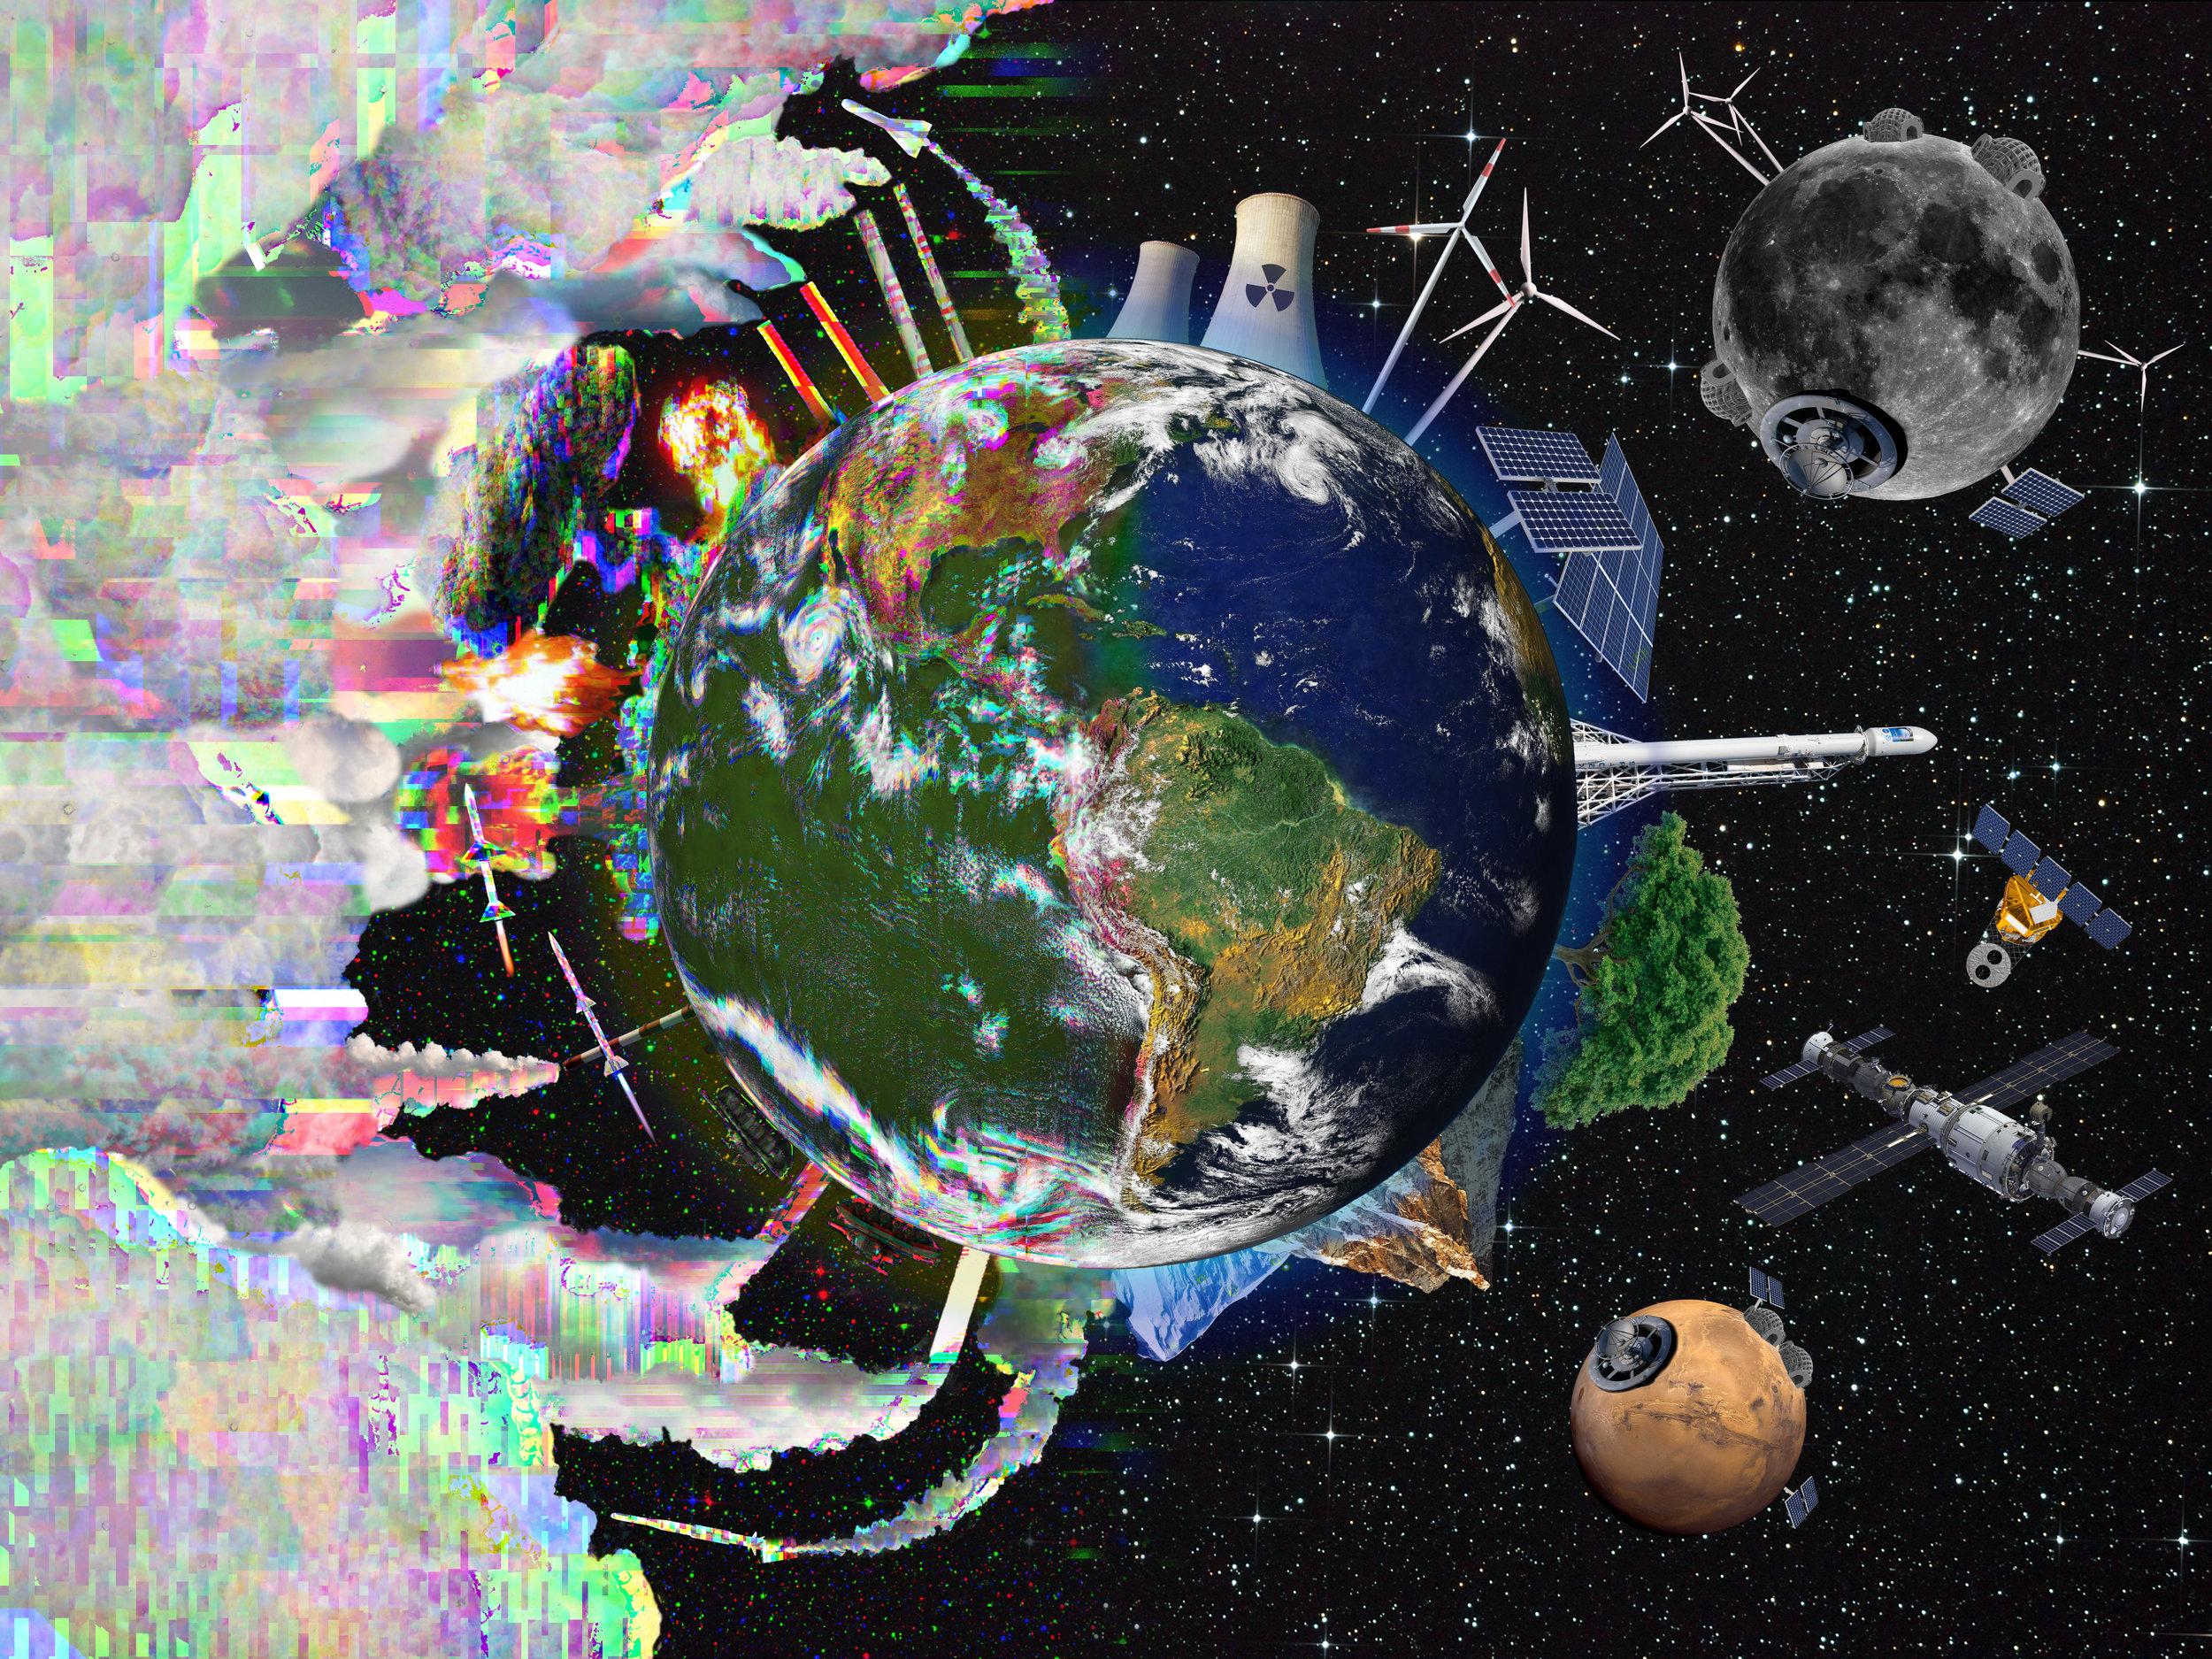 final_collage_glitch1.jpg